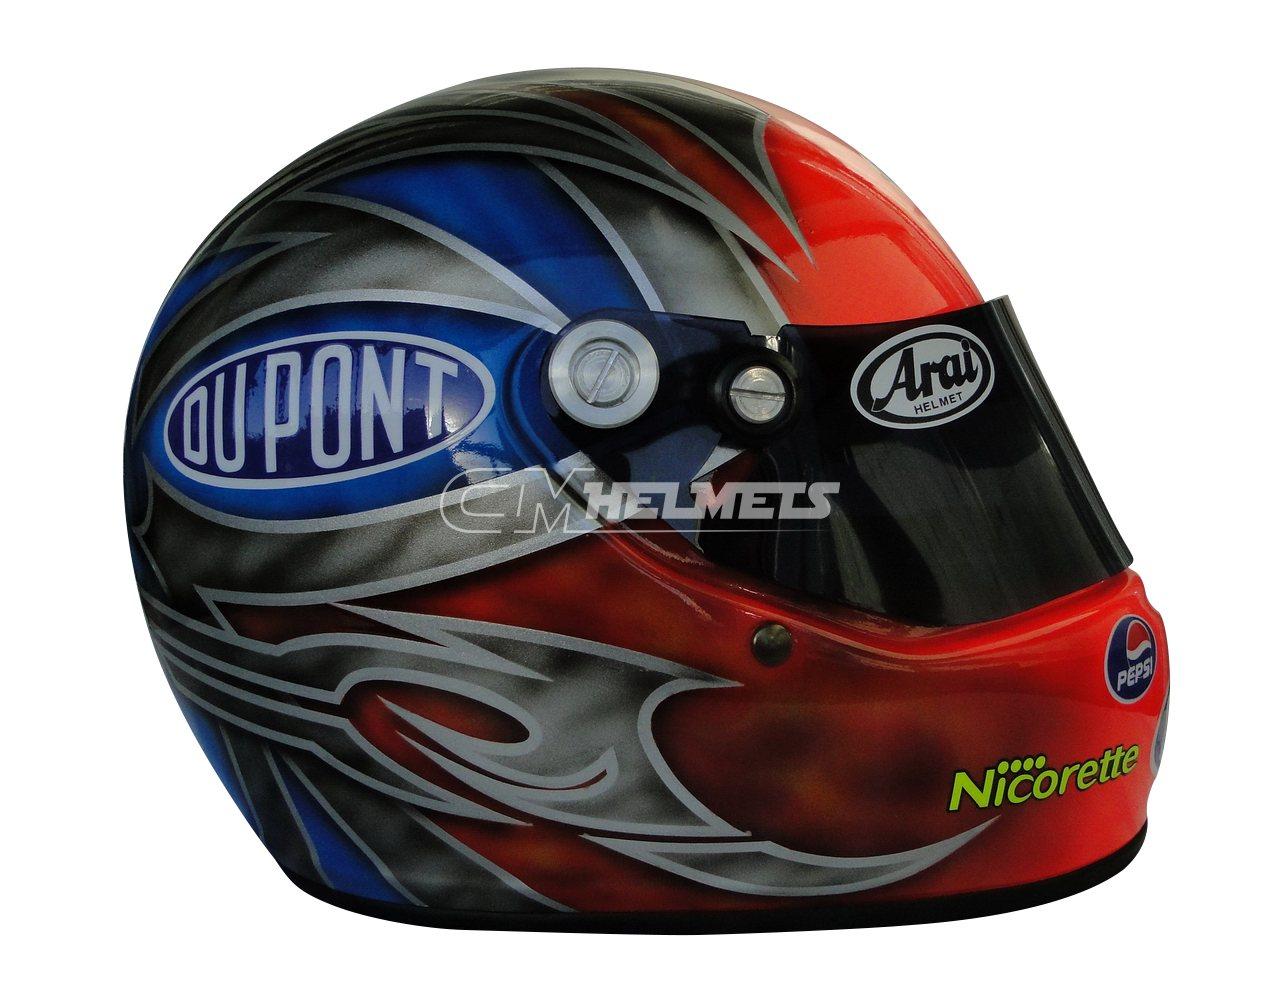 JEFF GORDON 2009 NASCAR REPLICA HELMET